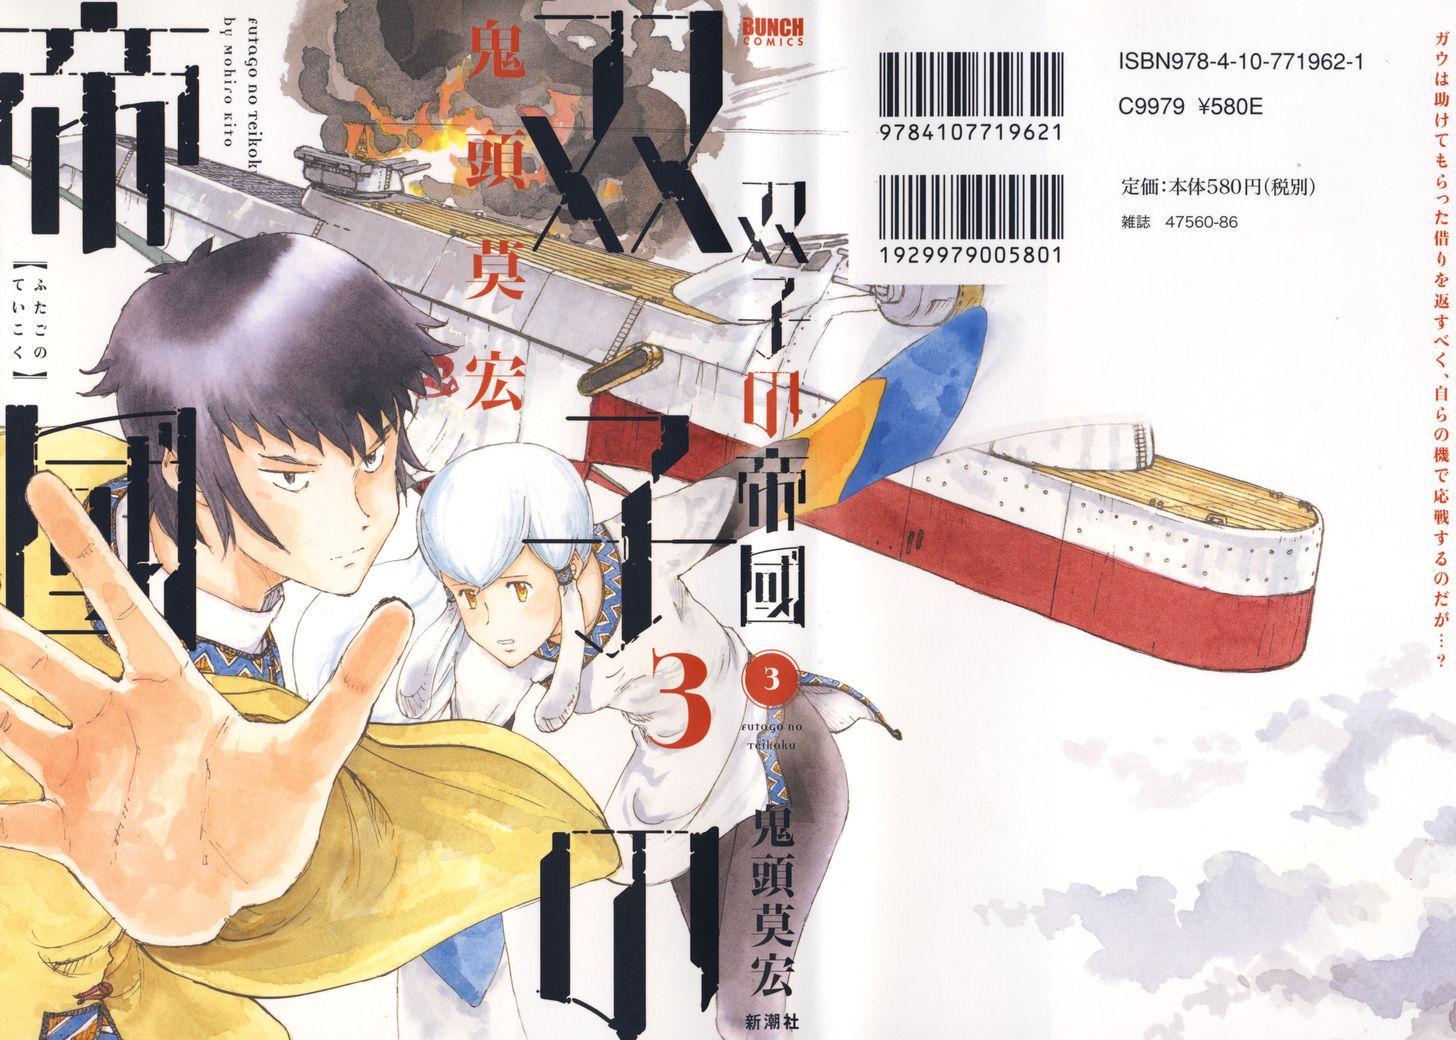 Futago no Teikoku 13: The Third Wing at MangaFox